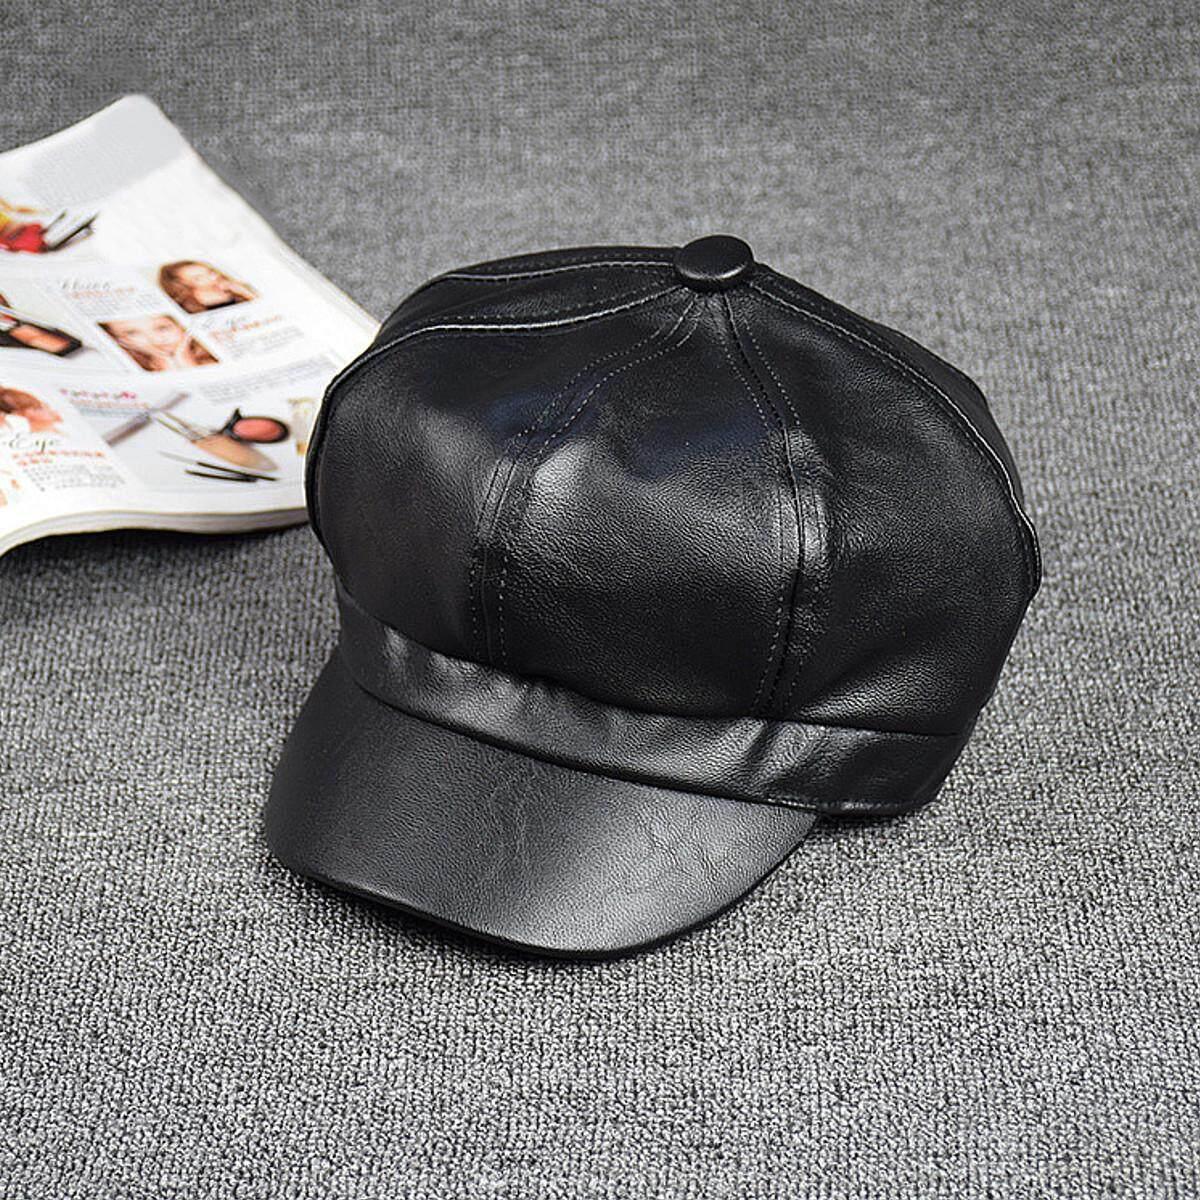 Wanita Kulit Hitam Topi Segi-delapan Baret Fashion Vintage Seniman Cap Kecantikan Topi Outdoor Topi Runcing-Intl